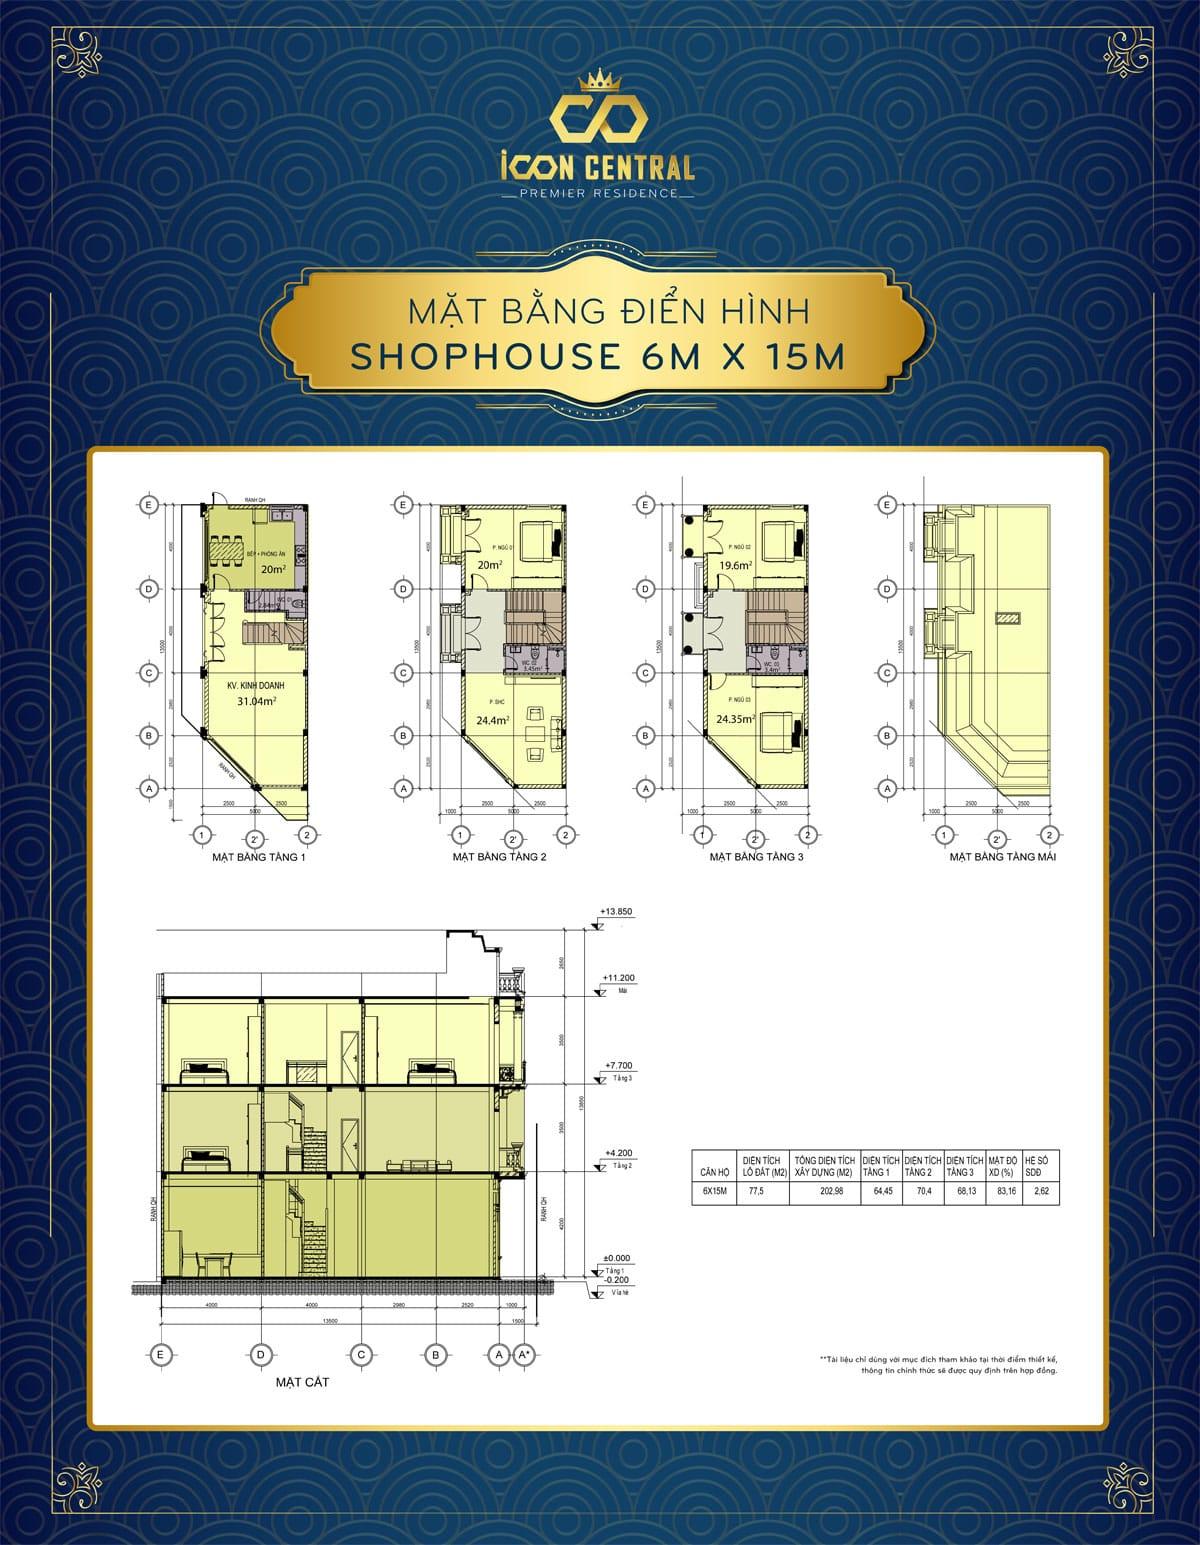 mat bang dien hinh shophouse di an 6x 15m icon central - SHOPHOUSE DĨ AN BÌNH DƯƠNG